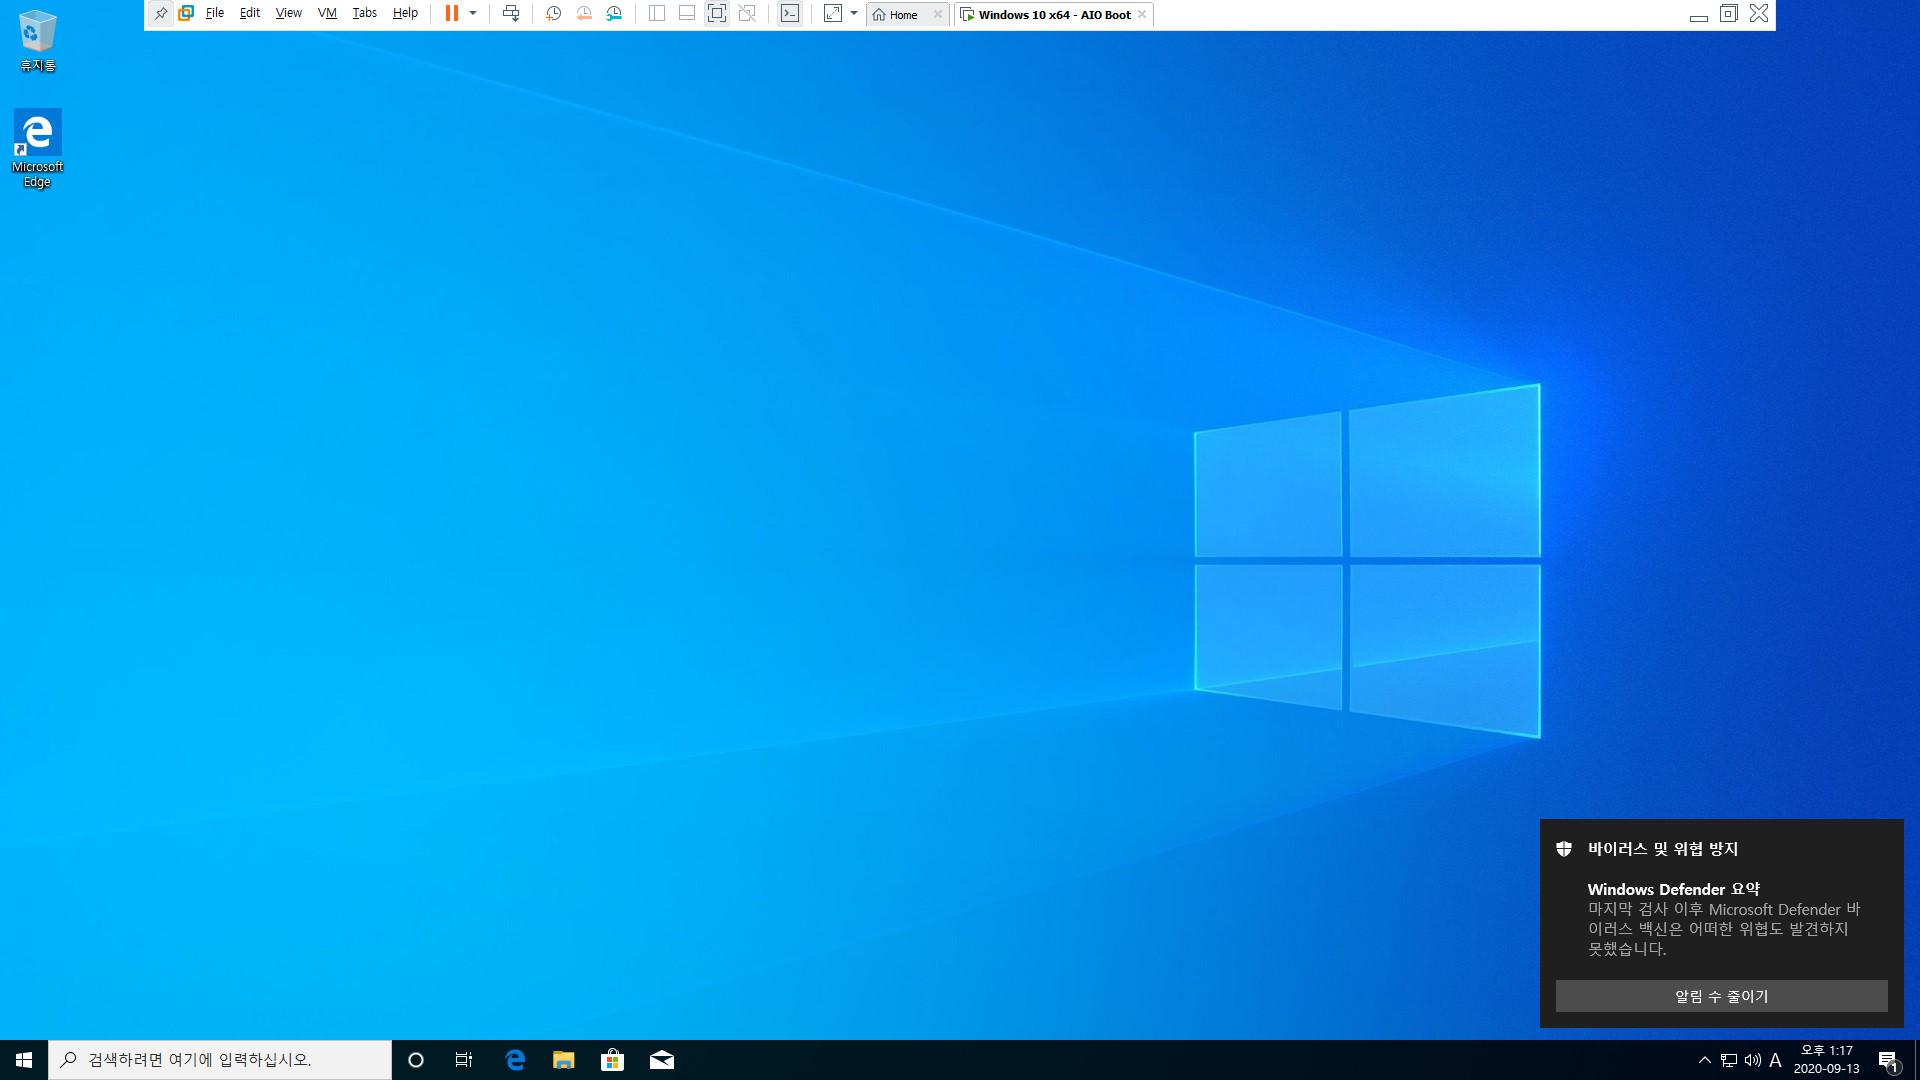 AIO Boot의 grubenv와 기타 설정하기2.bat 으로 설정 자동화하기 - 폰트 파일과 배경 사진 복사 가능 2020-09-13_131716.jpg